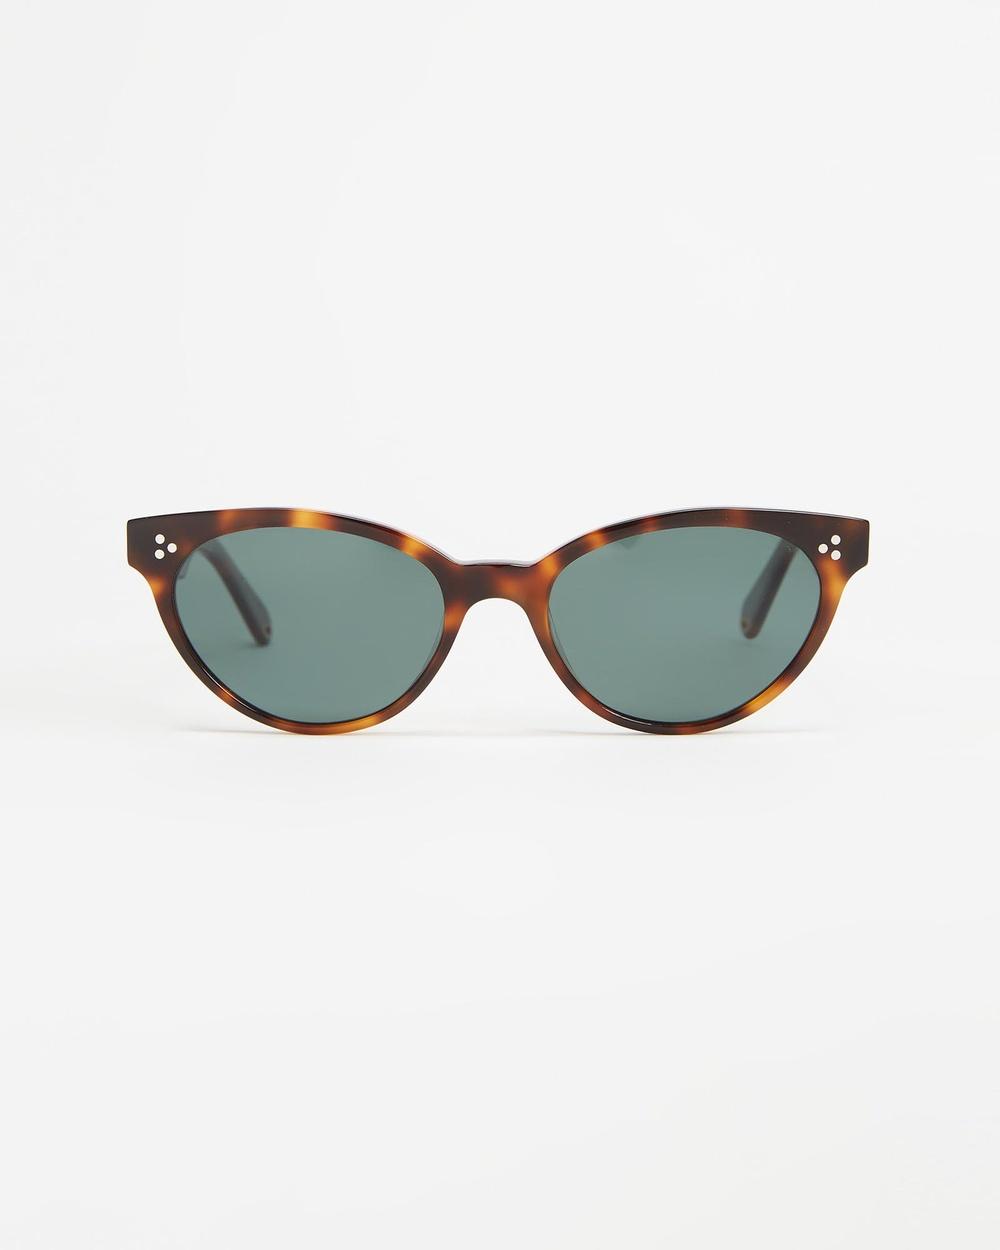 Pacifico Optical Francis Sunglasses Chocolate Havana & Green